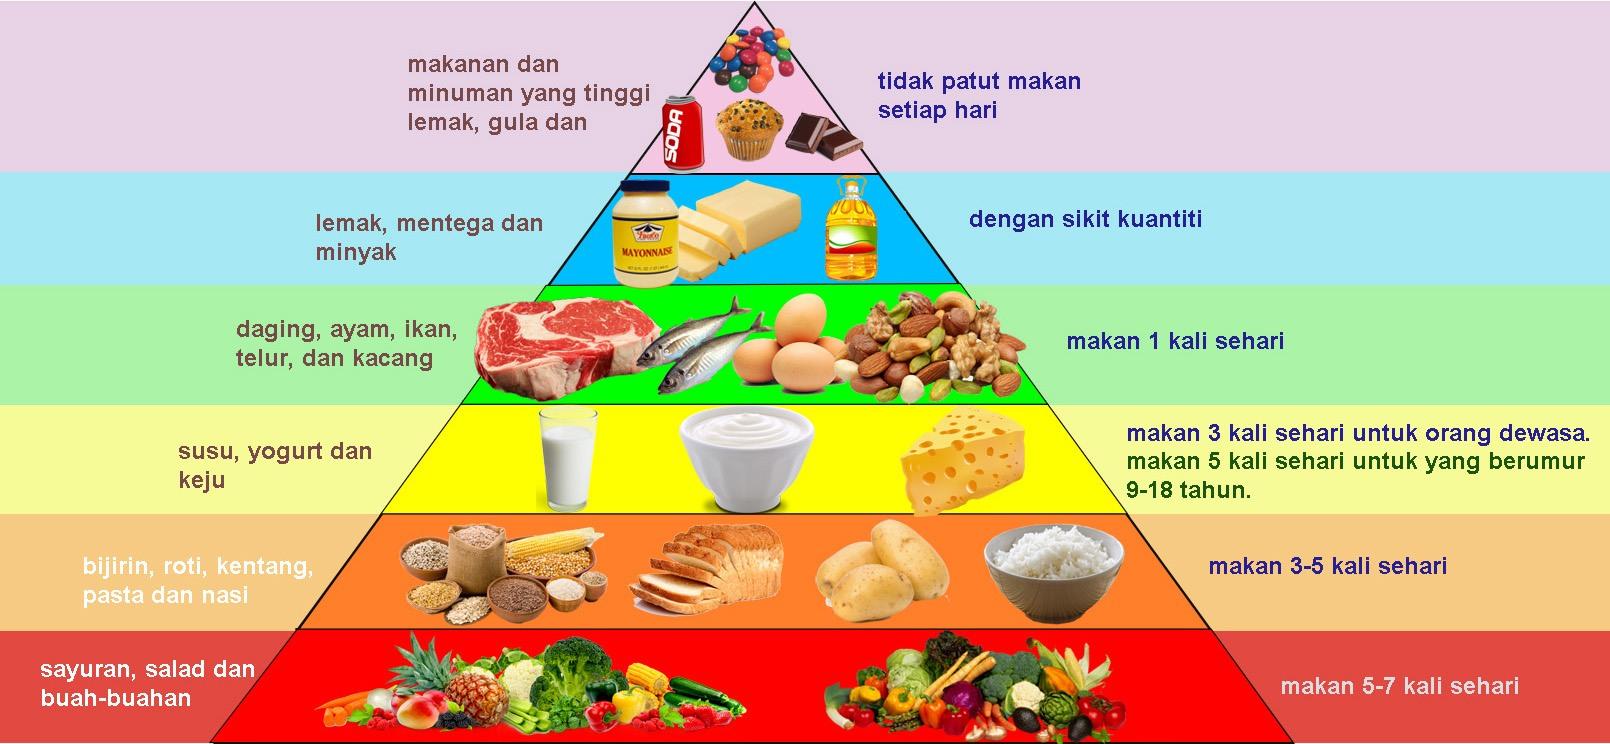 Sains Tahun 3 Kelas Makanan Dan Makanan Seimbang Quiz Quizizz